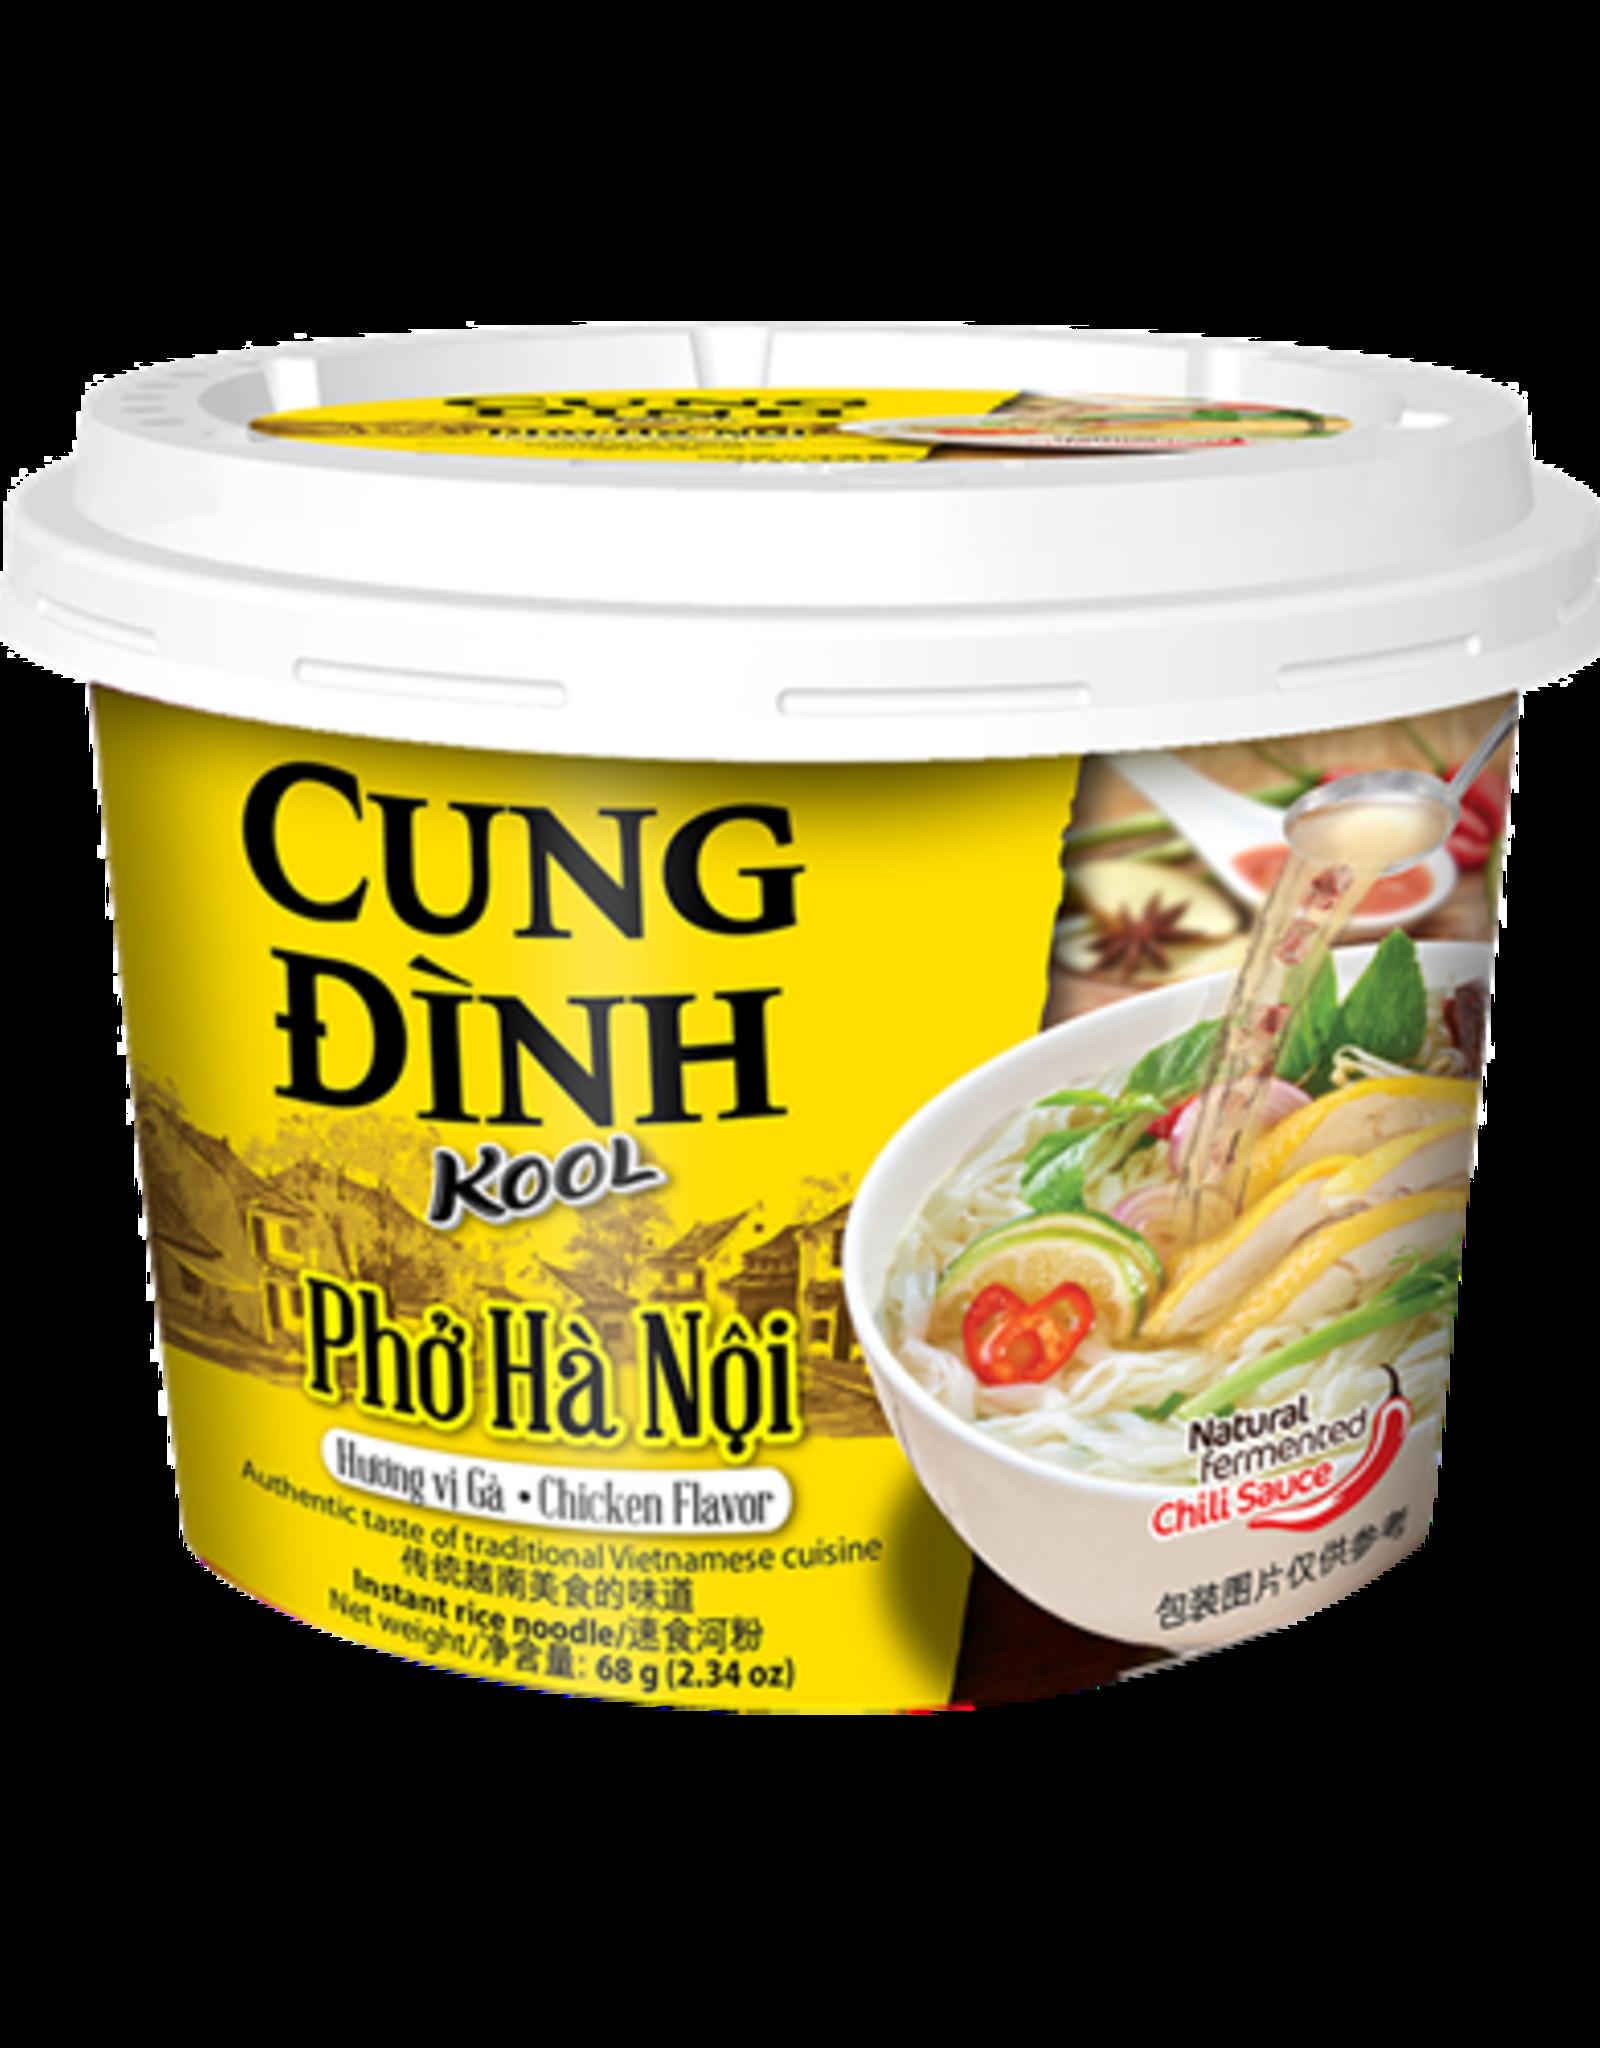 Cung Dinh Inst Rijstnoedels Kool Merk - Pho Ga (Cup) 68g